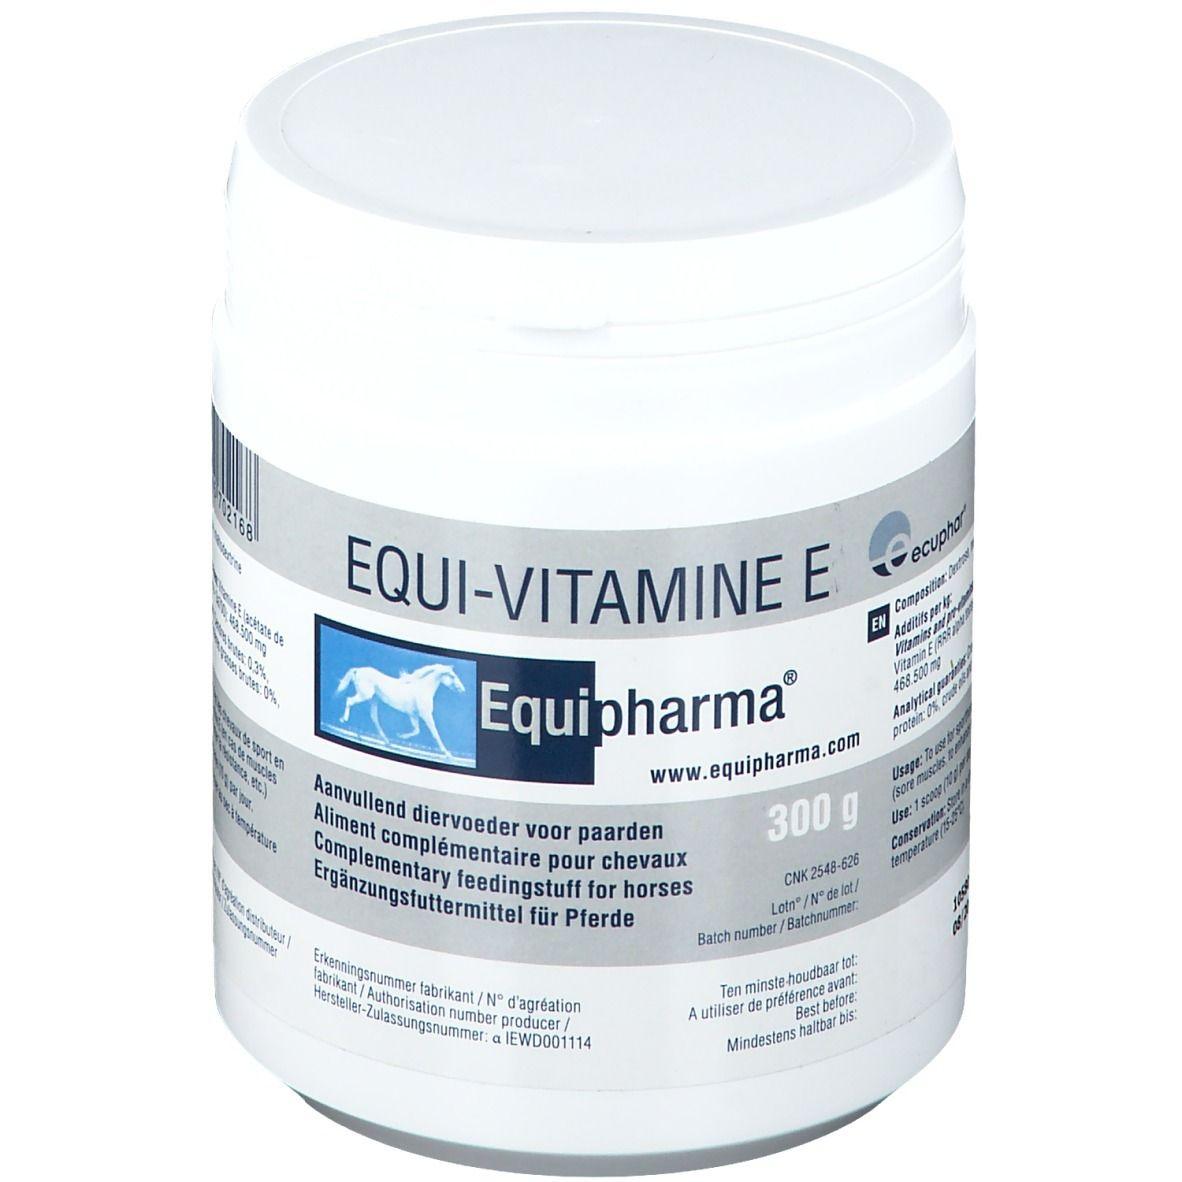 Equipharma® EQUI-VITAMINE E g poudre